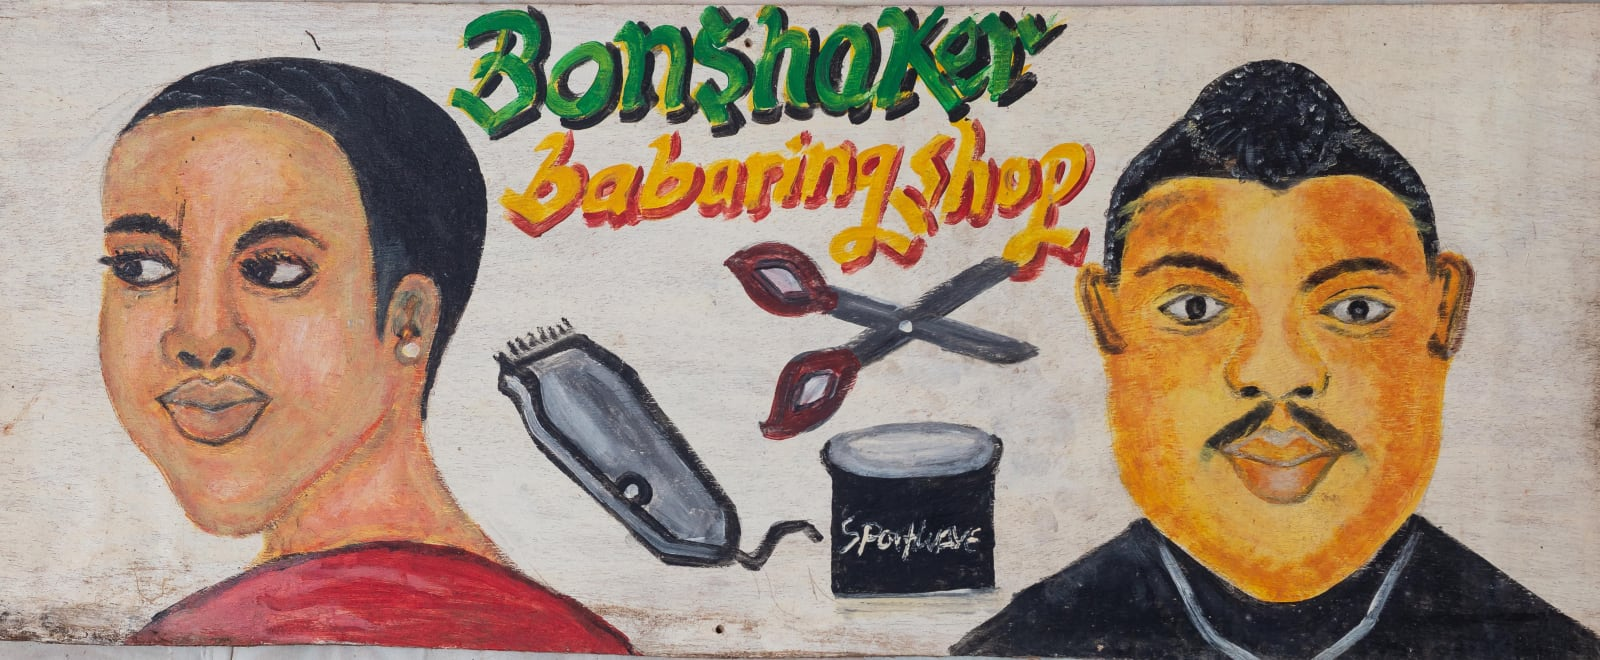 Bonshaker Barbering Shop 36 x 91.5 cm